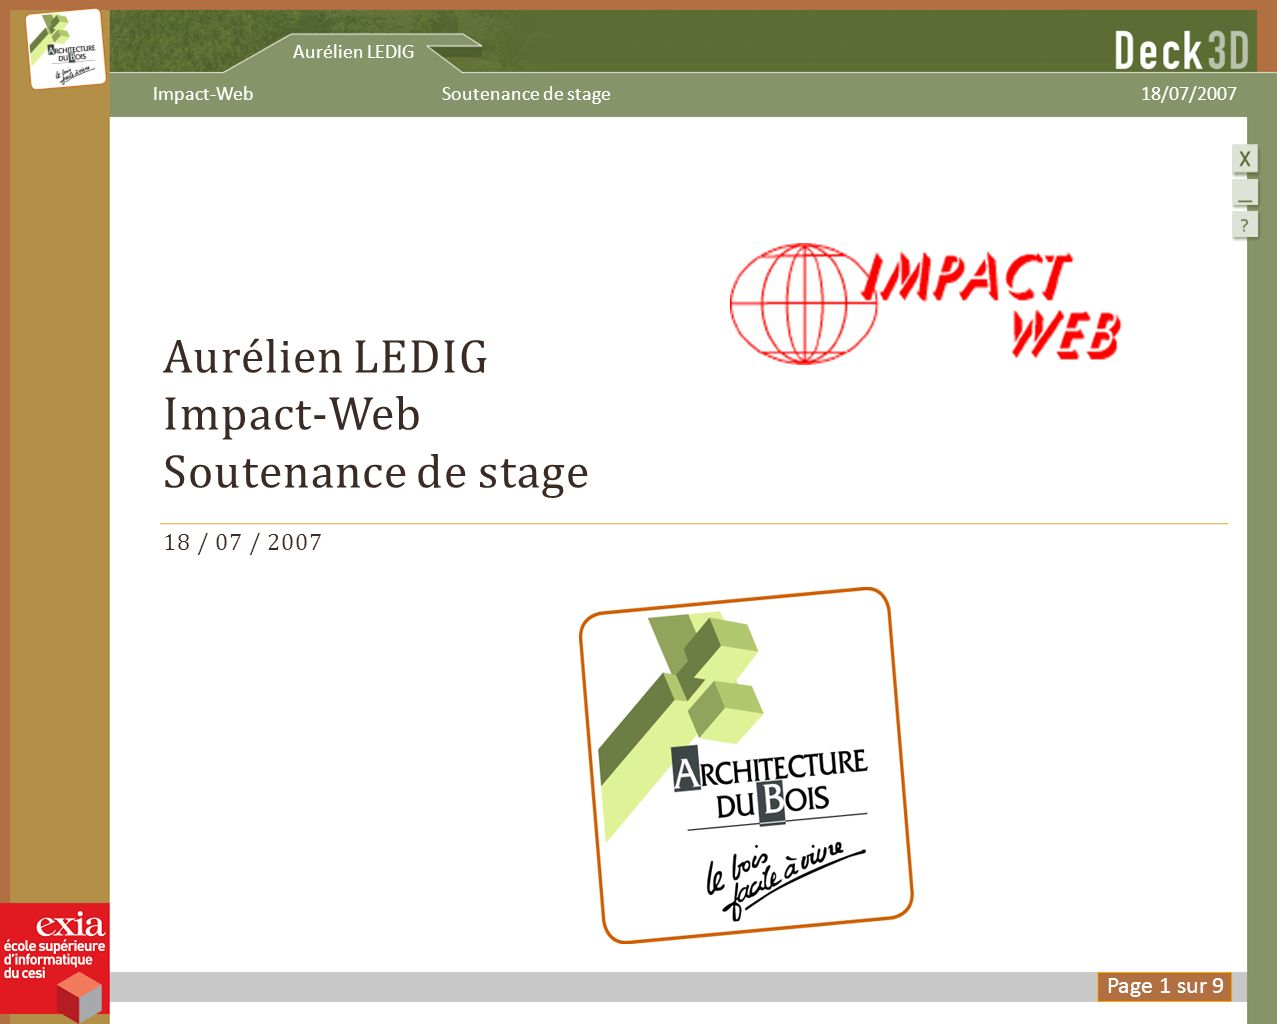 Aurélien LEDIG 18/07/2007 Aurélien LEDIG Impact-Web Soutenance de stage 18 / 07 / 2007 Soutenance de stageImpact-Web